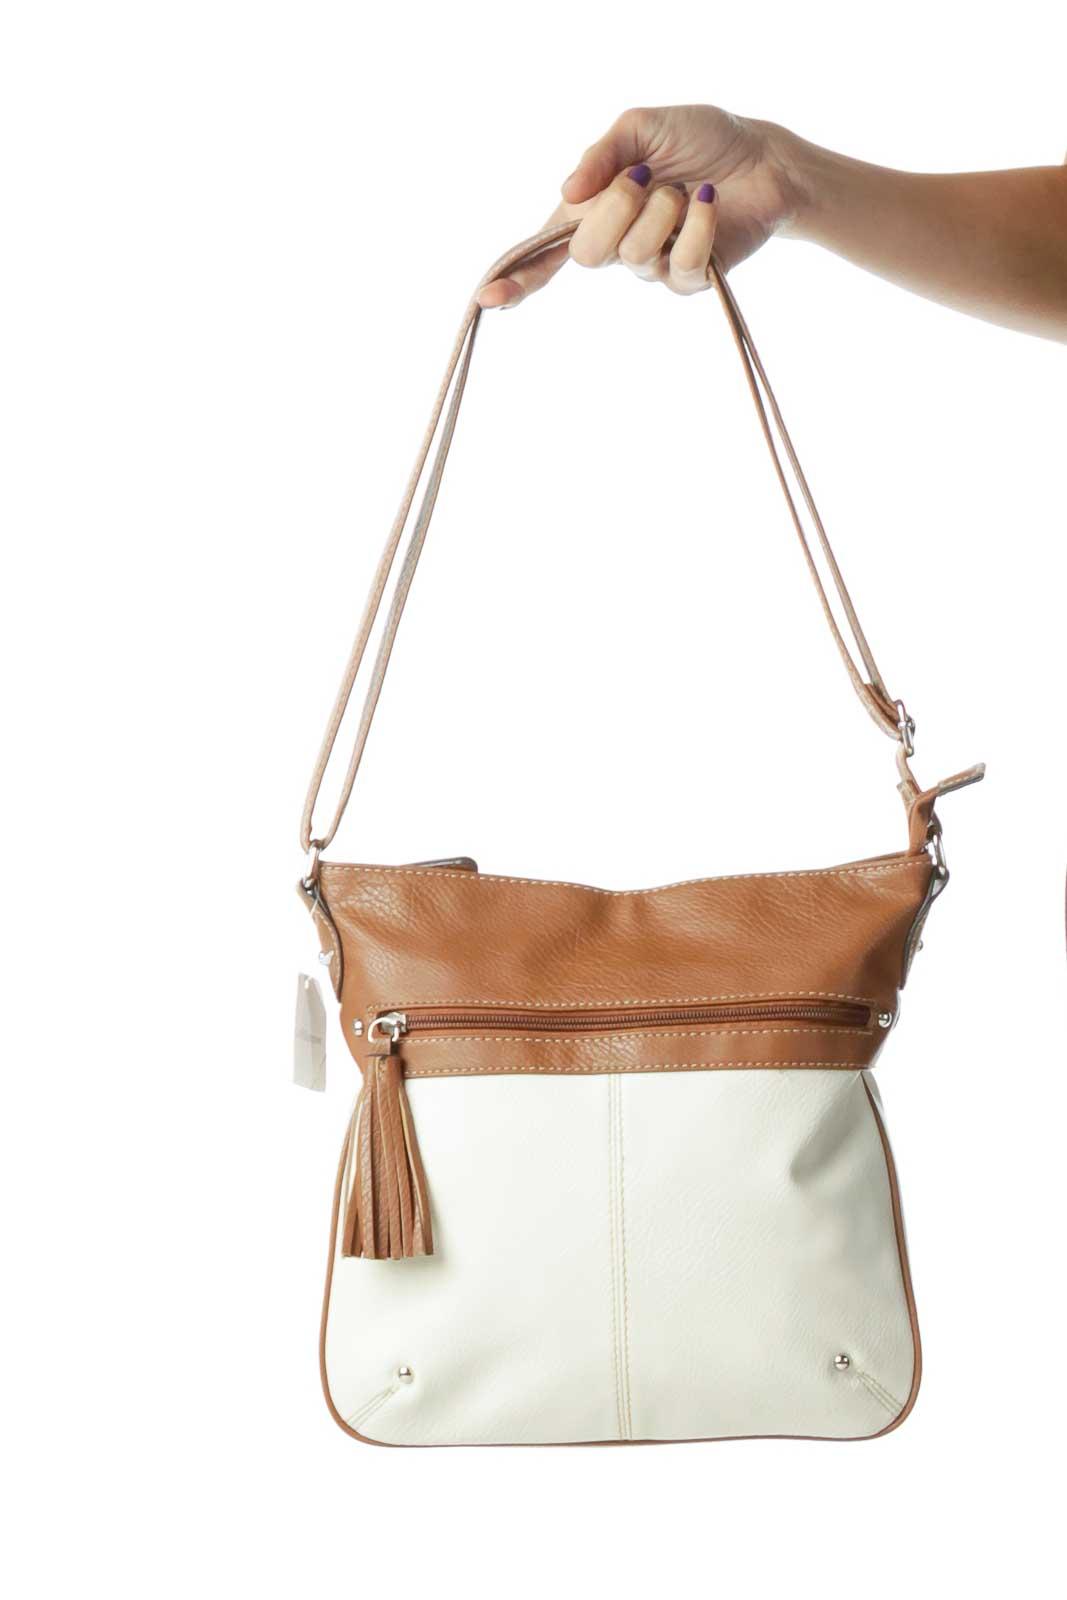 Brown Cream Crossbody Bag Front